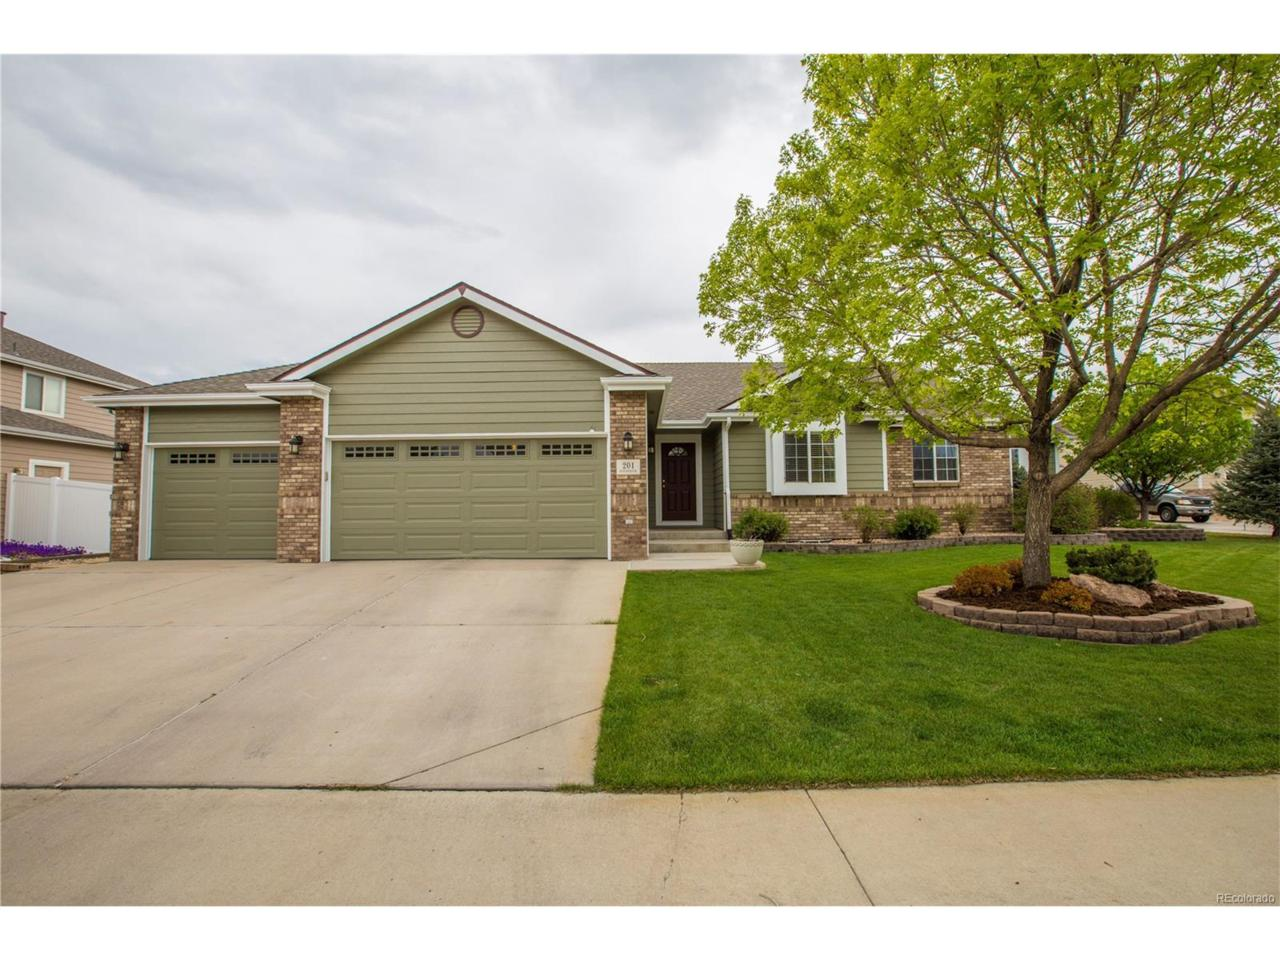 201 Rock Bridge Drive, Windsor, CO 80550 (MLS #9298871) :: 8z Real Estate